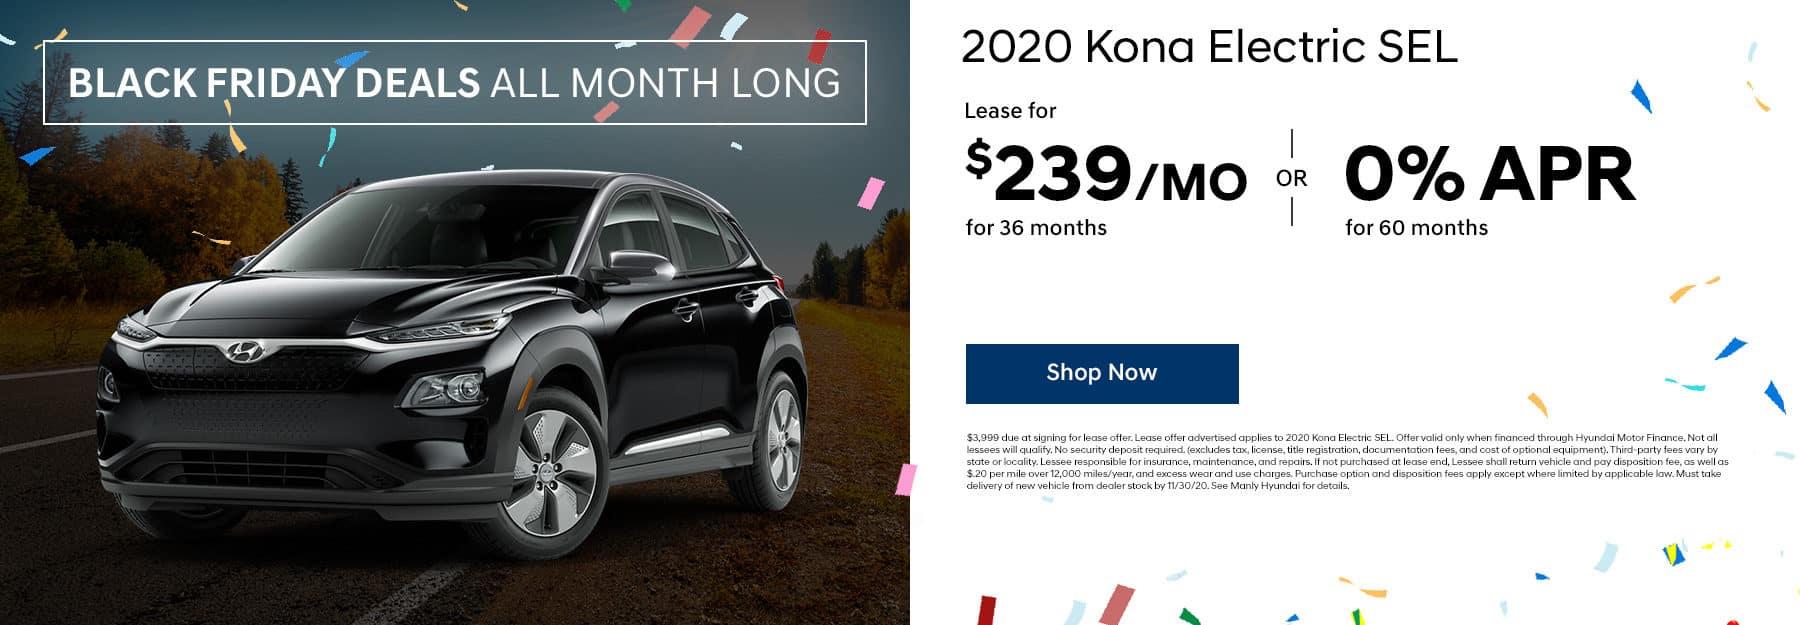 2020 Kona Electric Lease offer